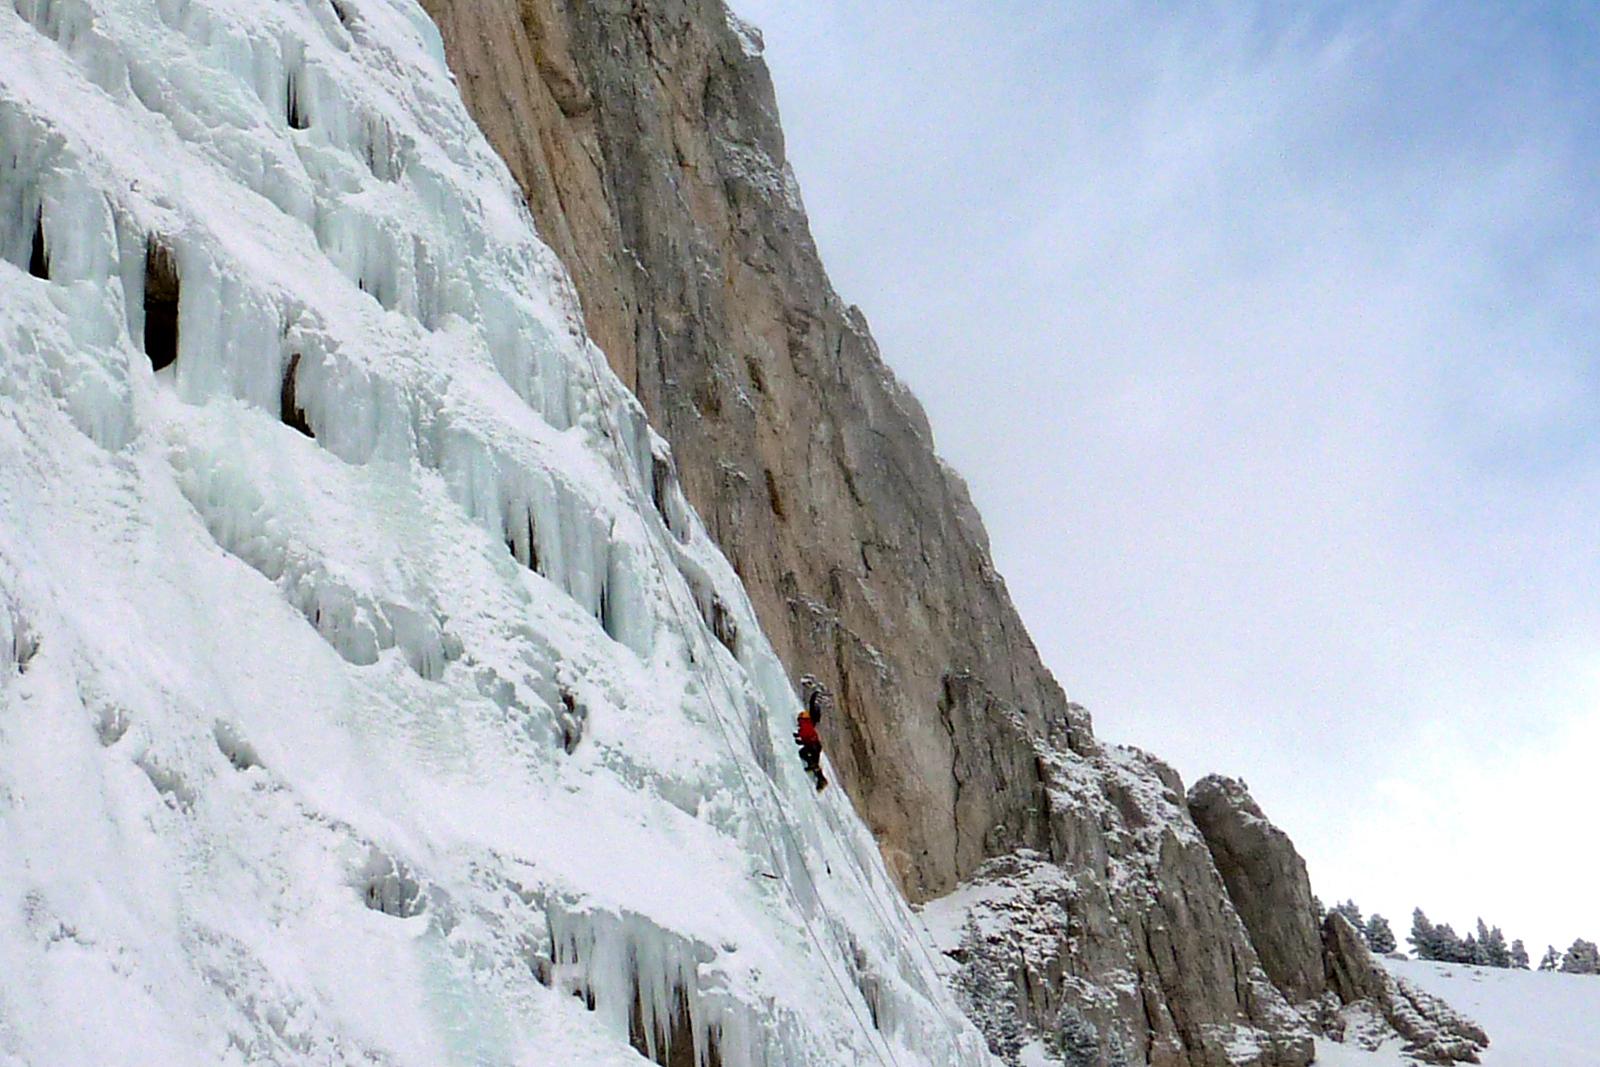 Calendrier sorties - Grande voie cascade de glace